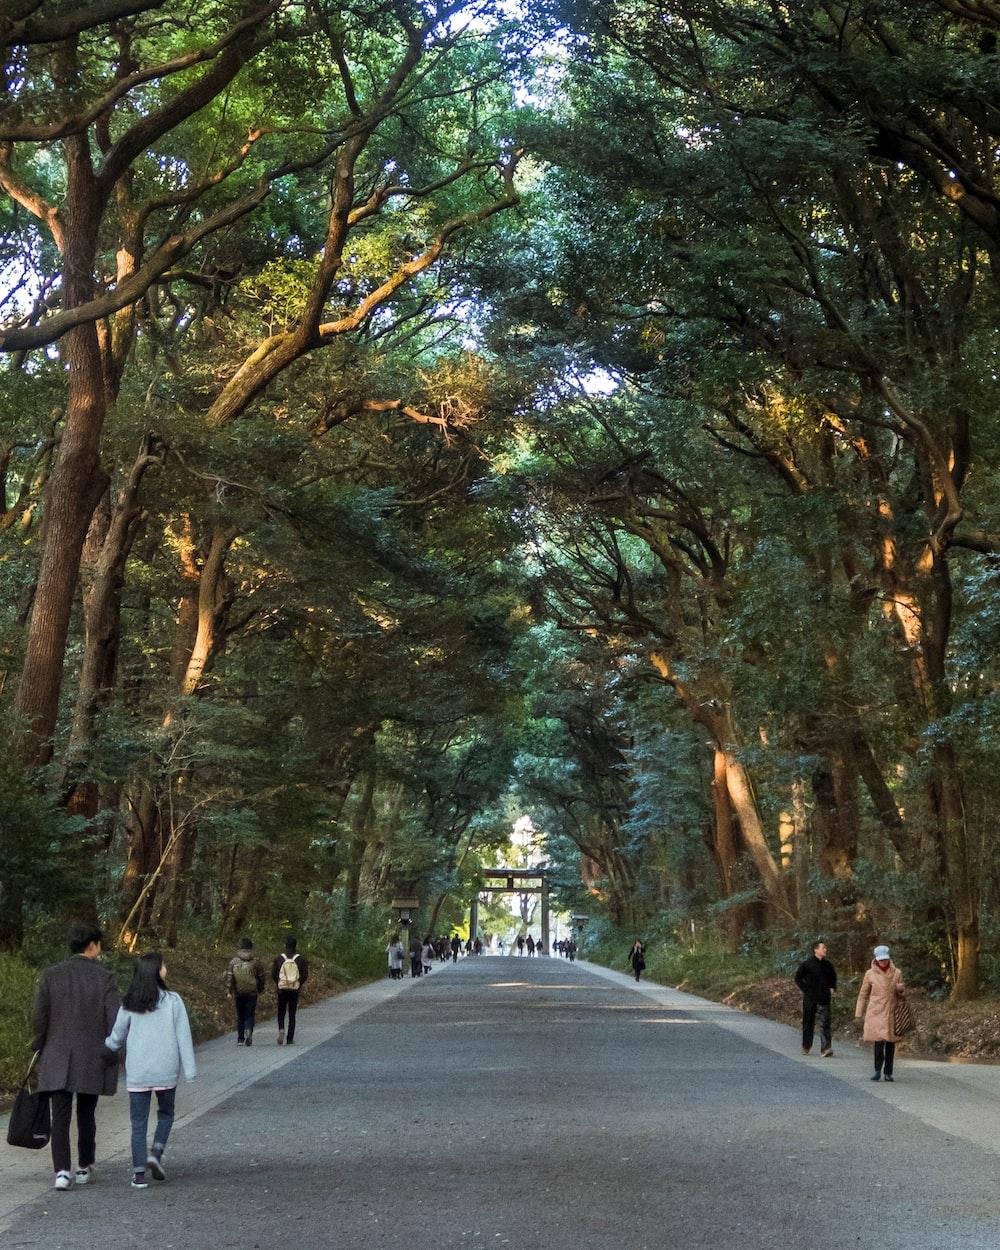 people walking on road between trees during daytime